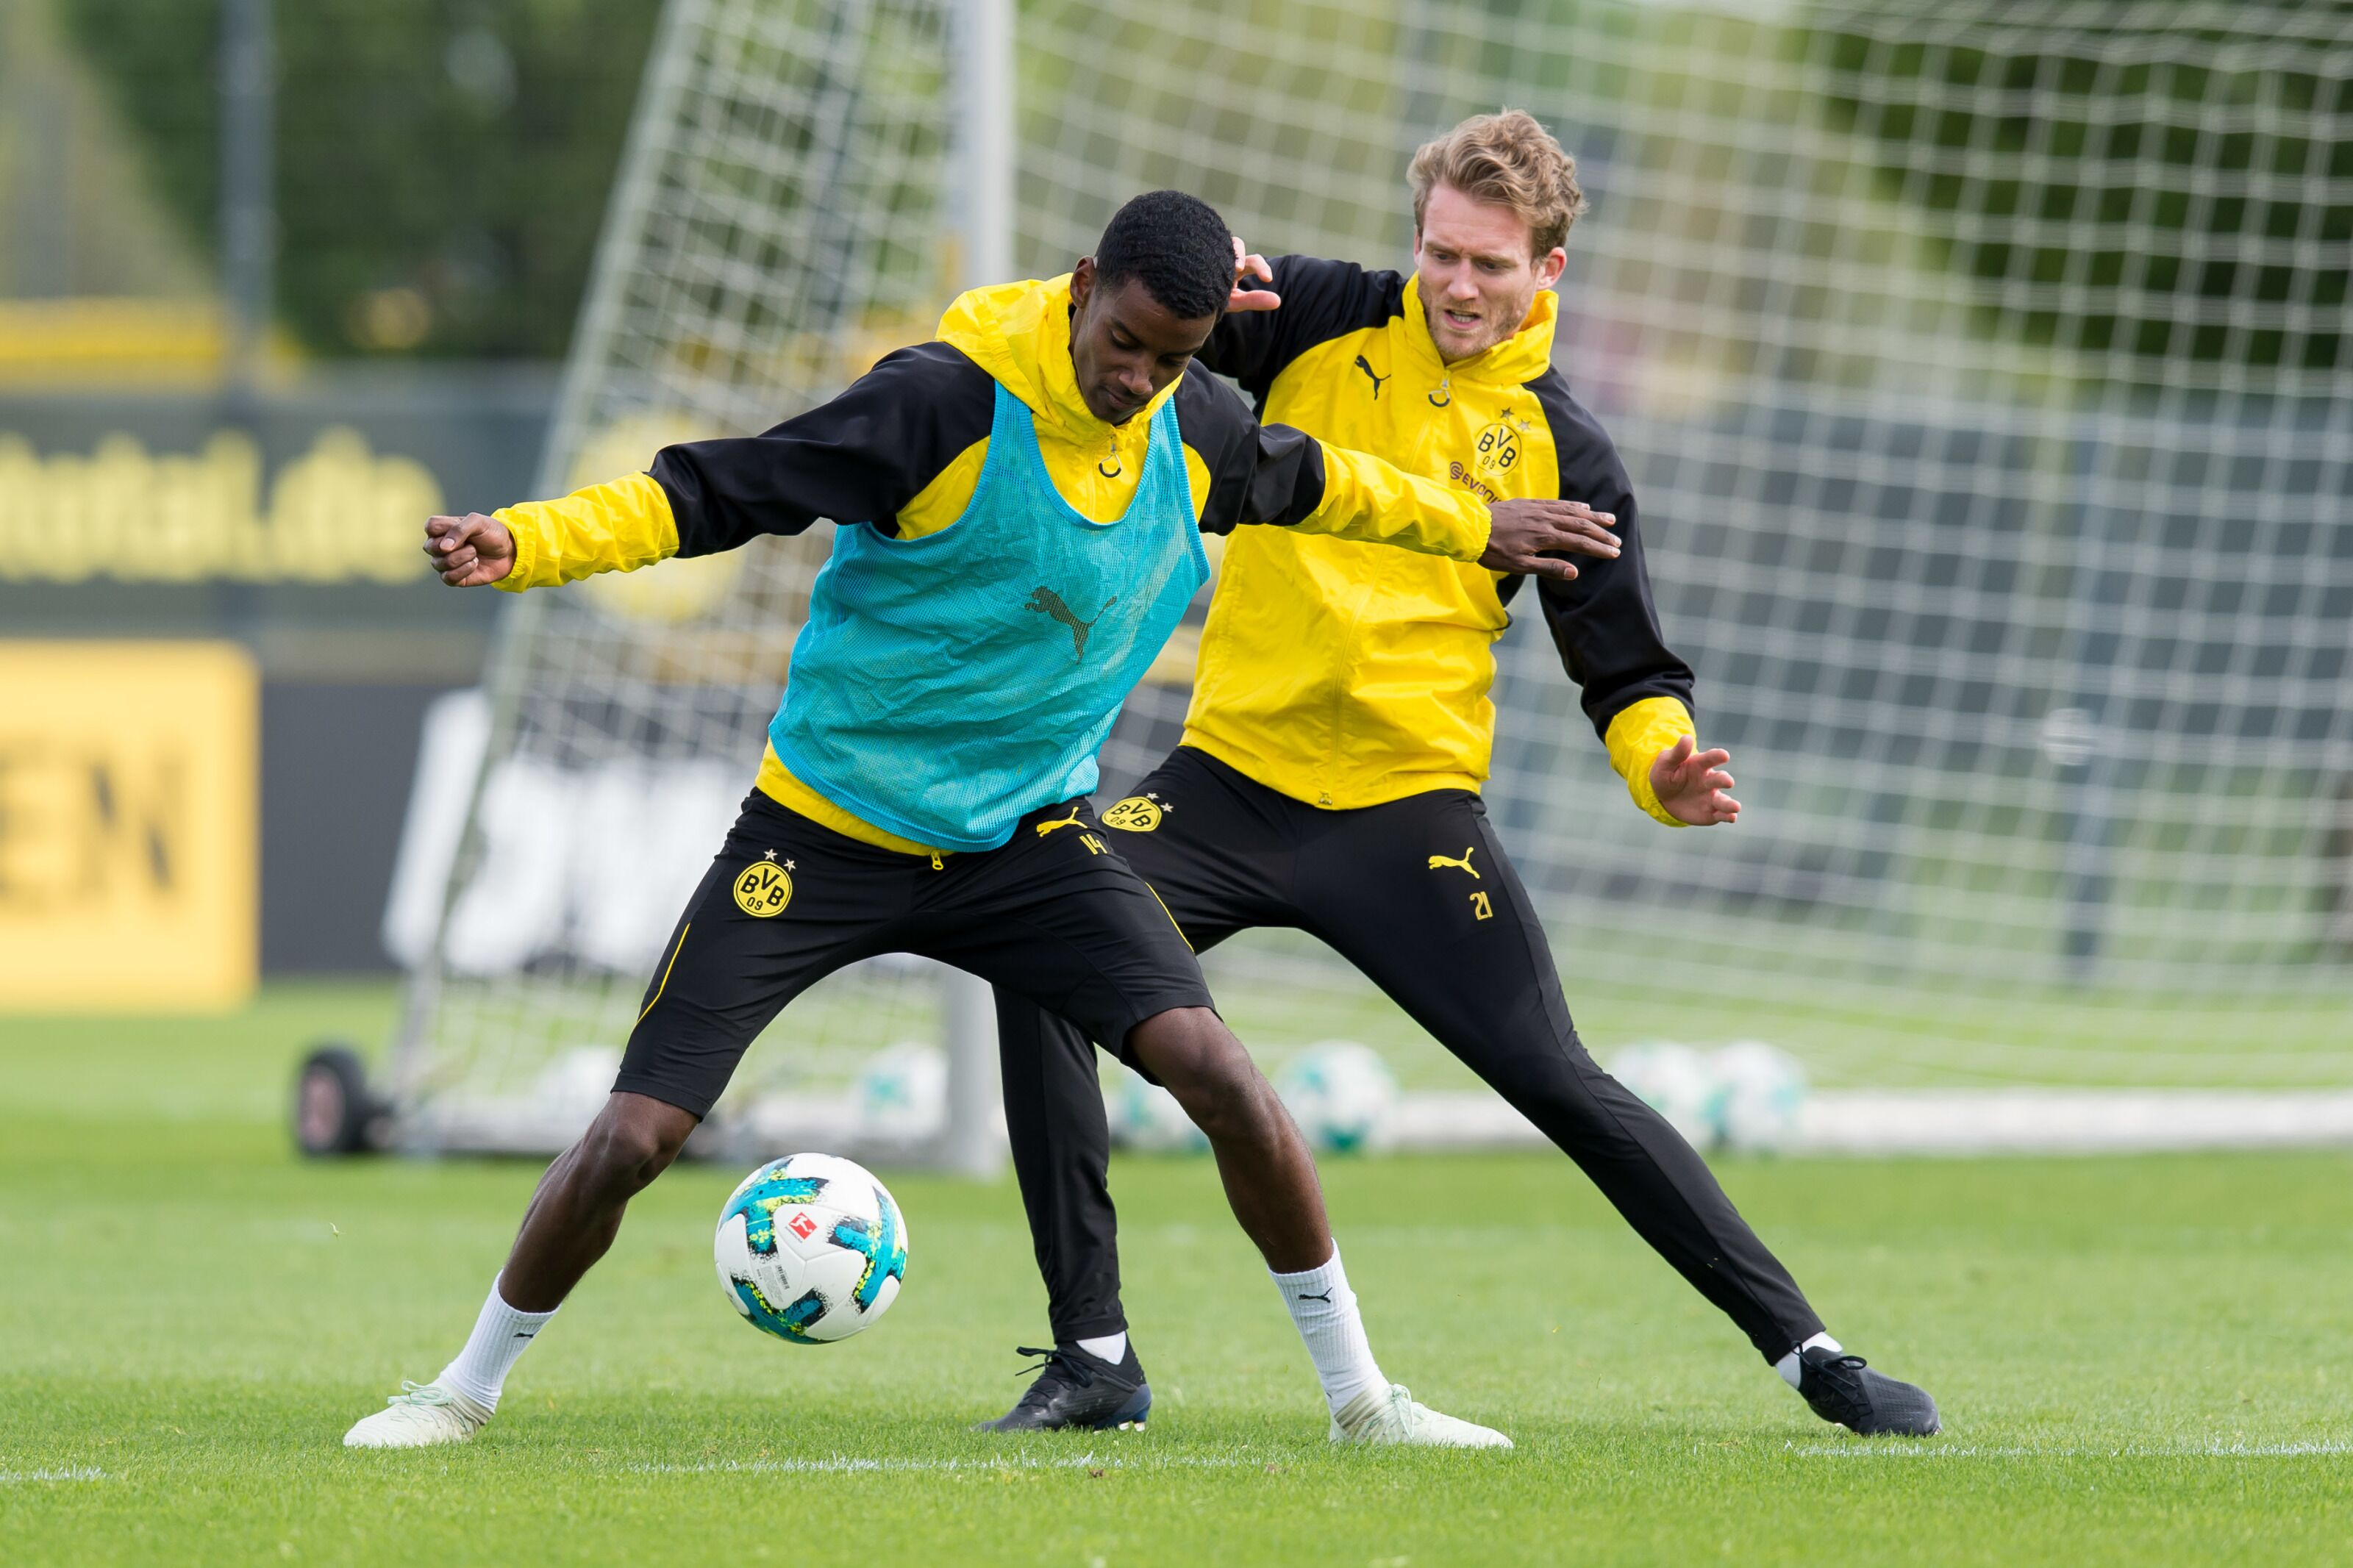 Borussia Dortmund Transfer Rumors: Clubs show interest in Isak, Schurrle and Toljan